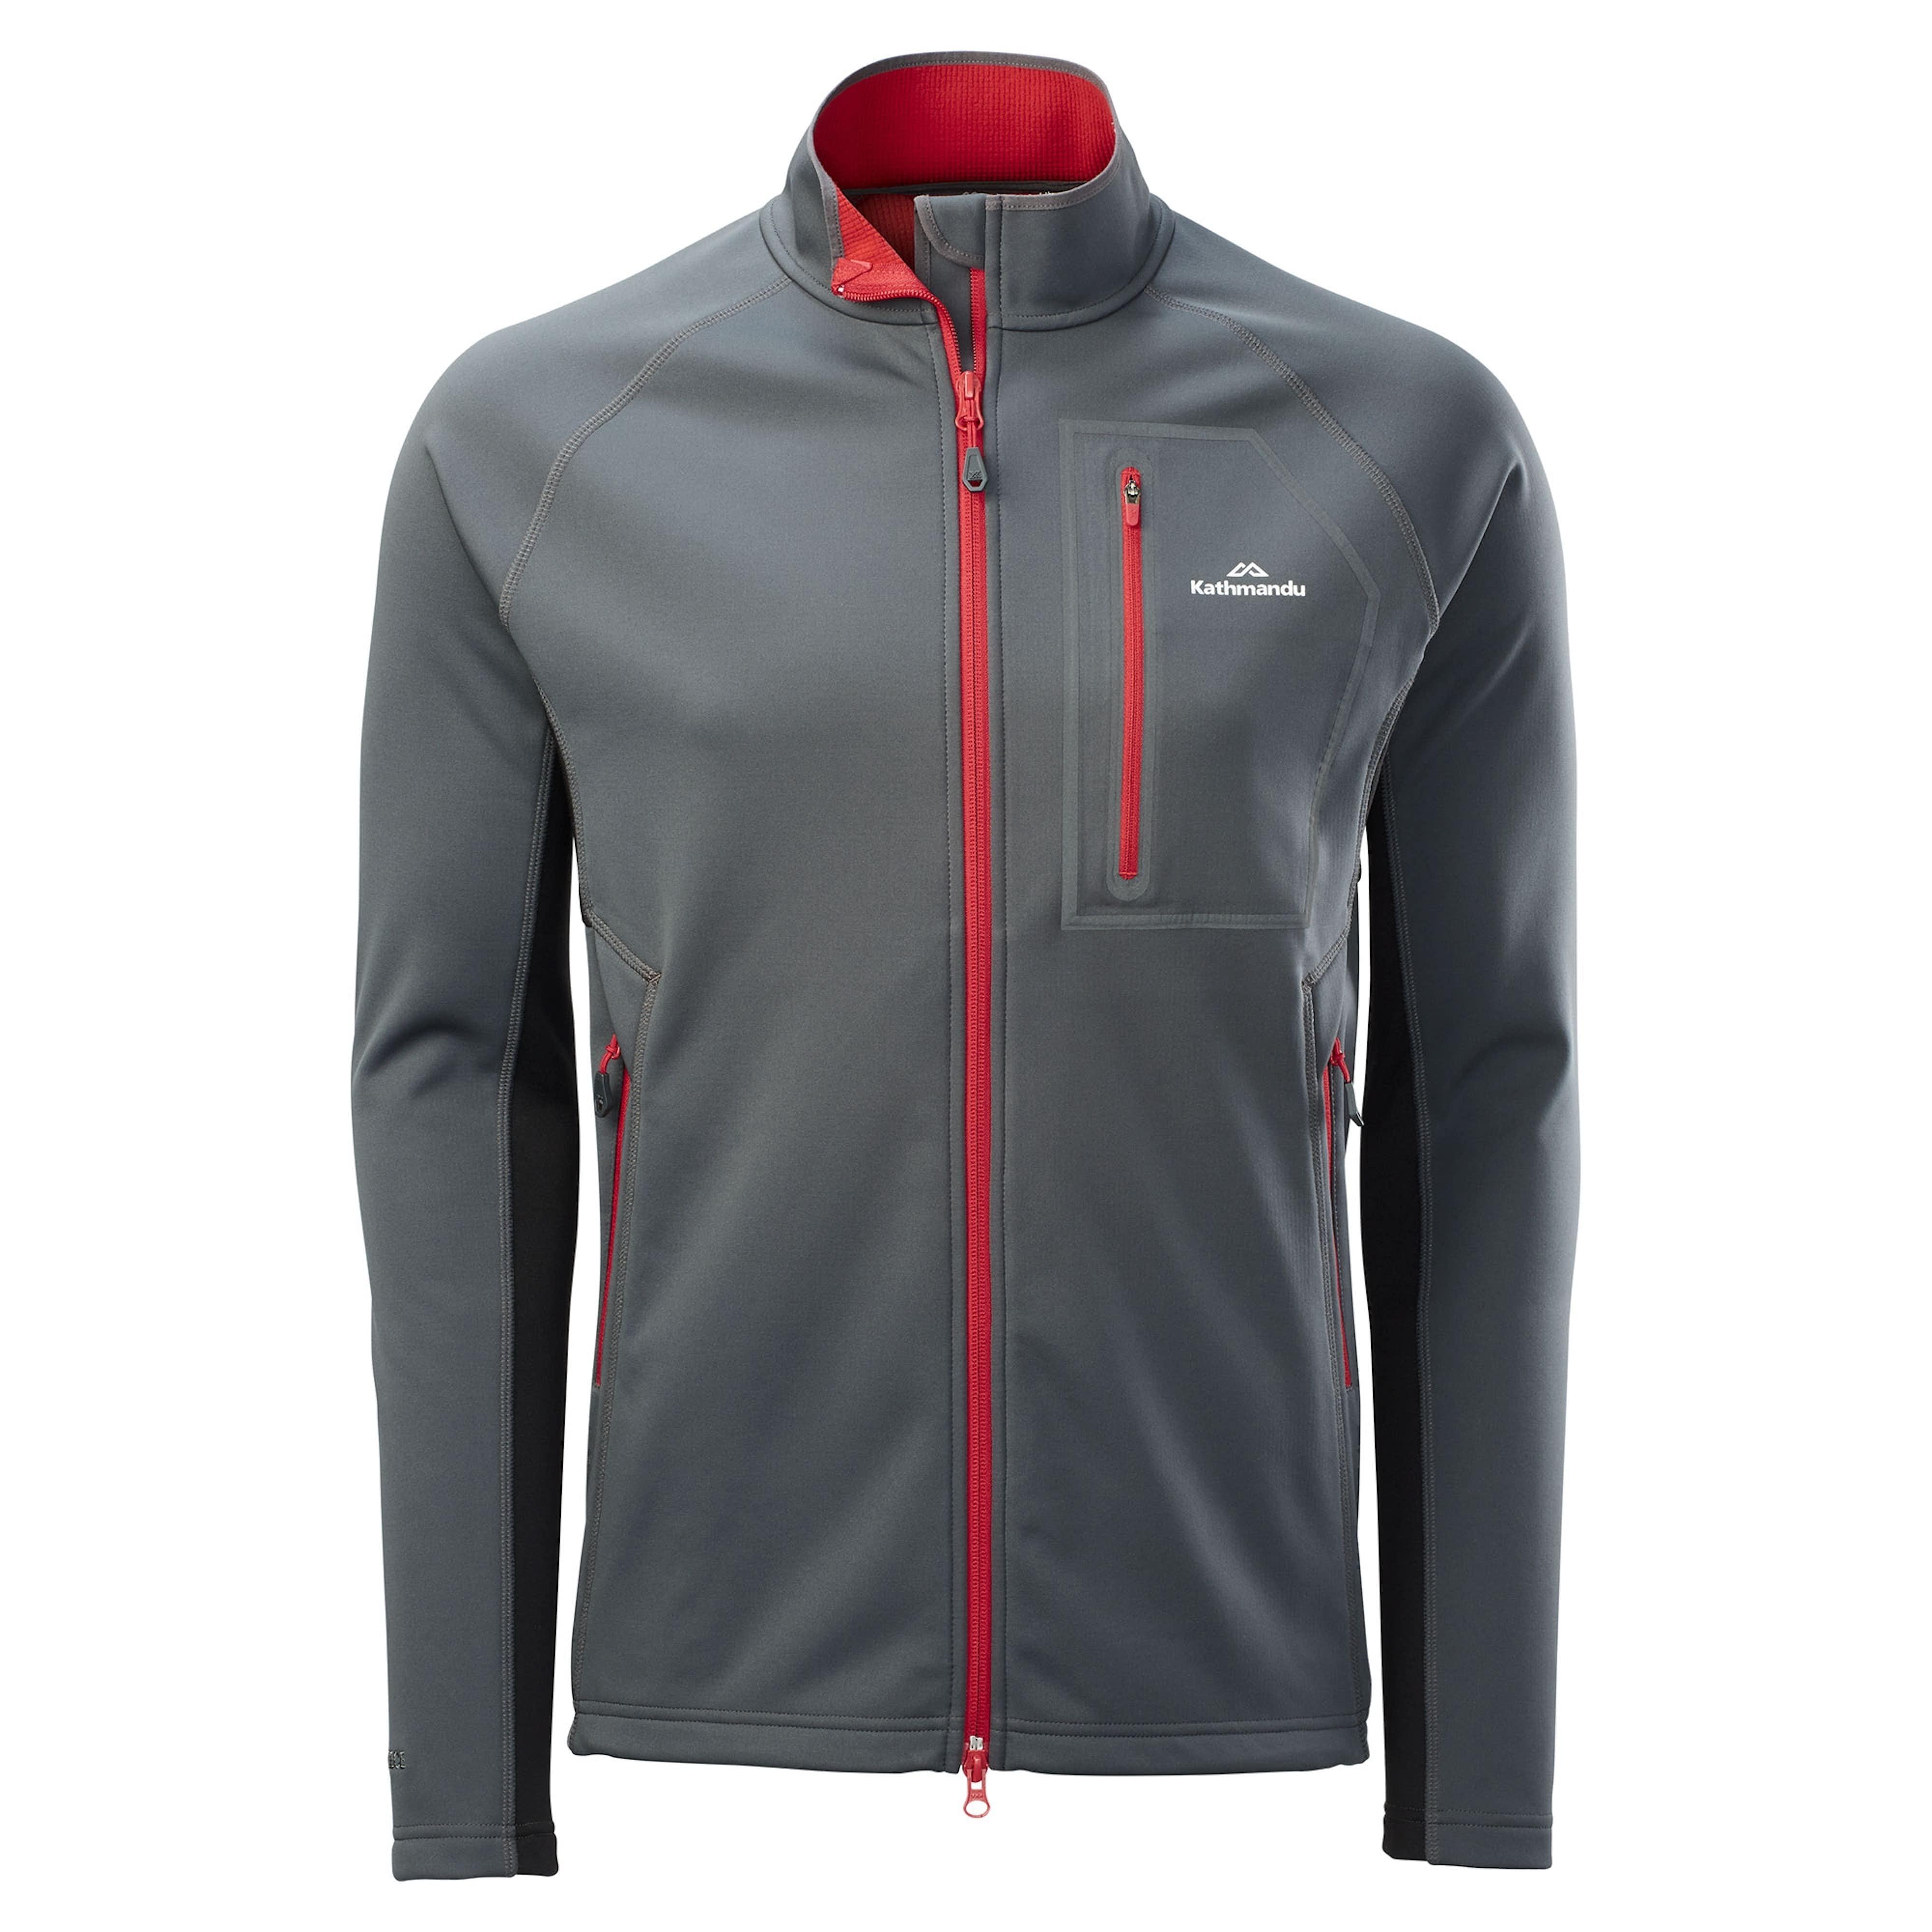 7a0891397 Mens Jackets for Sale Online | Winter Coats for Men in Australia